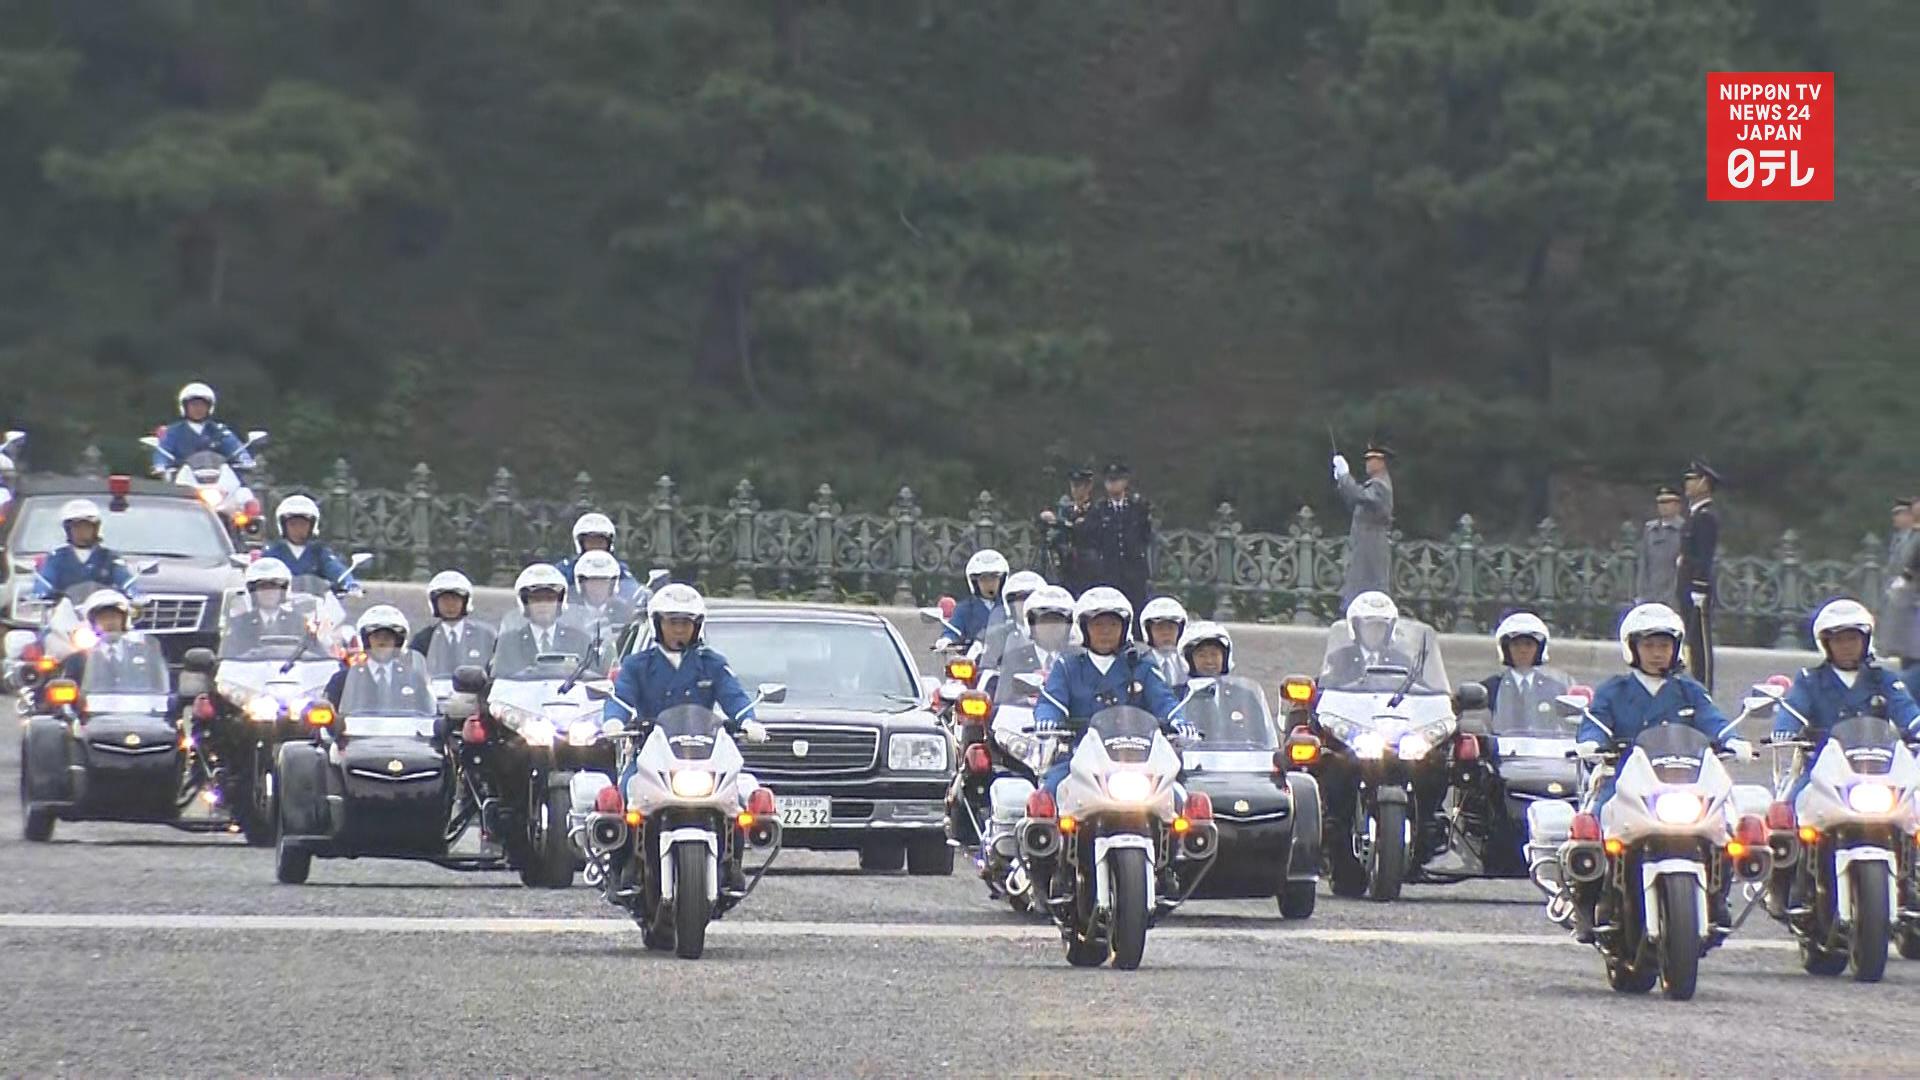 Imperial parade rehearsal hits Tokyo streets